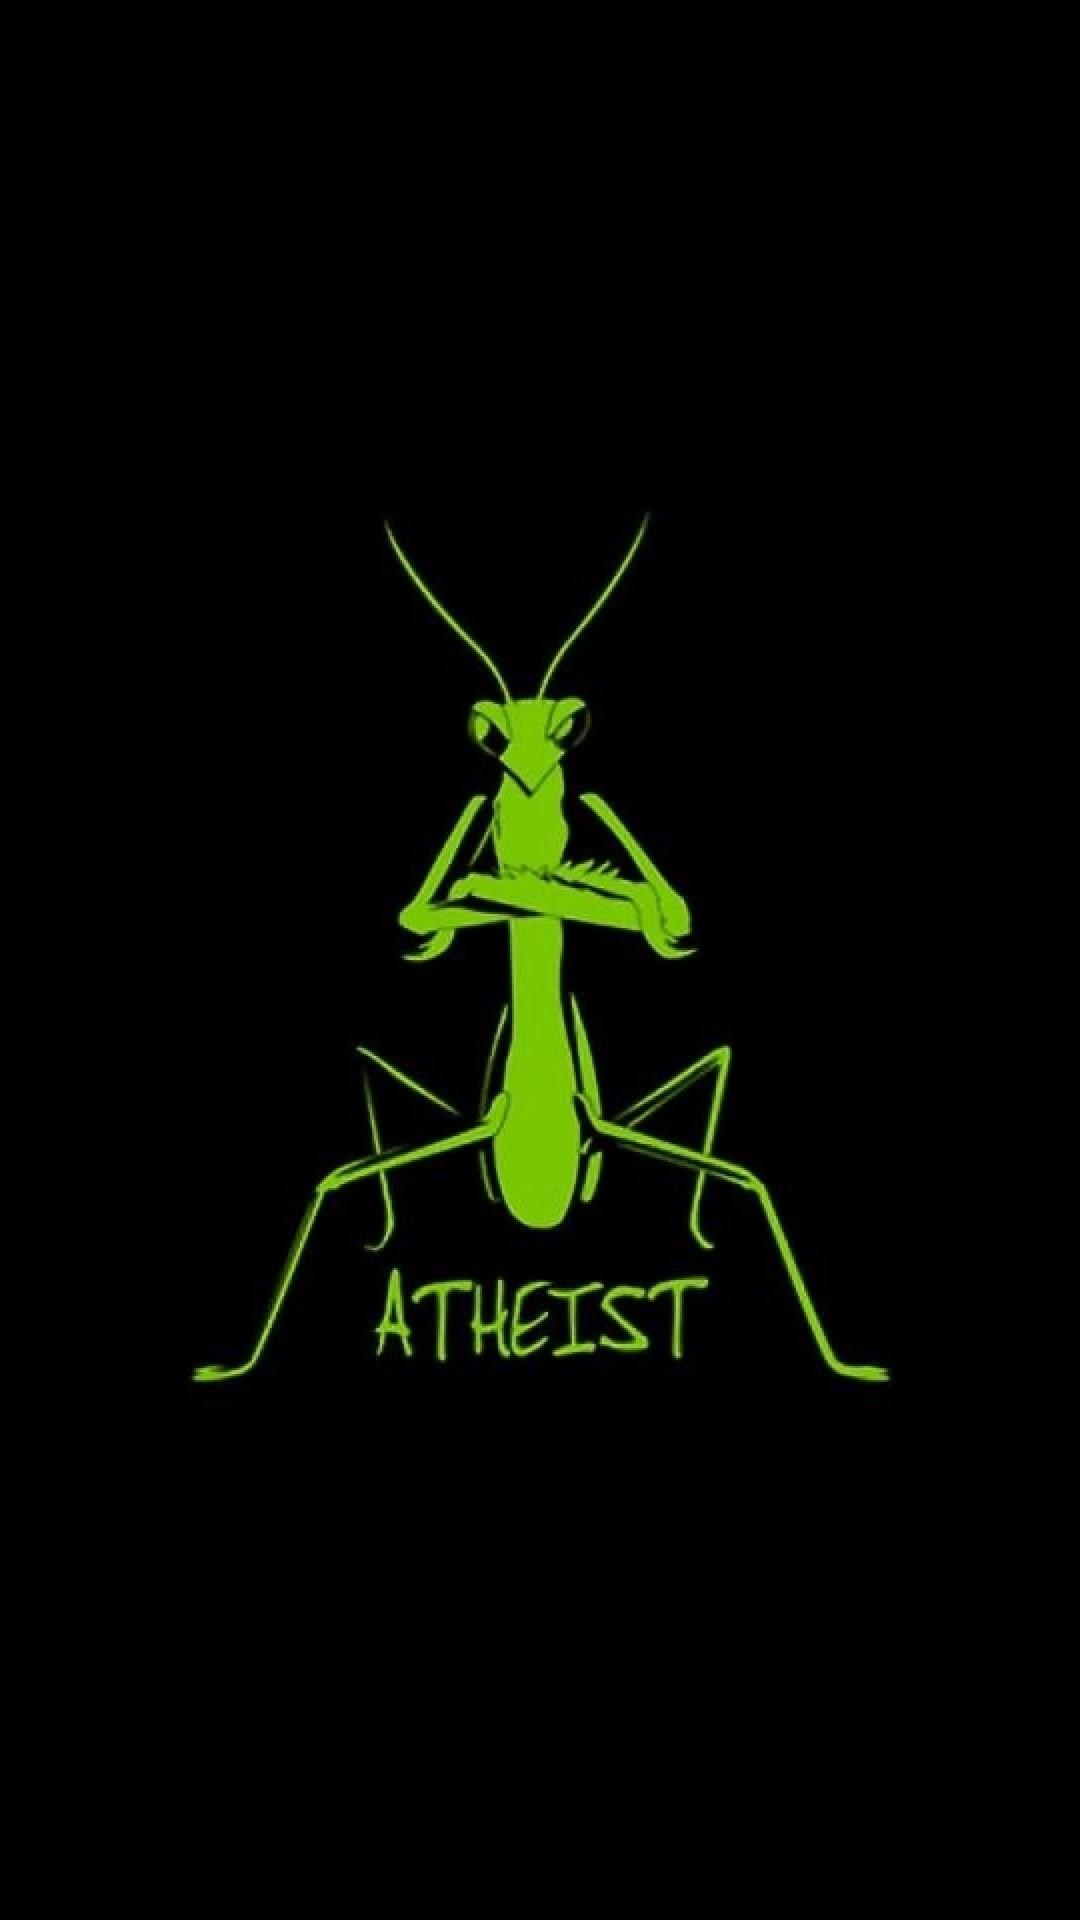 Atheist wallpaper wallpapertag - Atheist desktop wallpaper ...